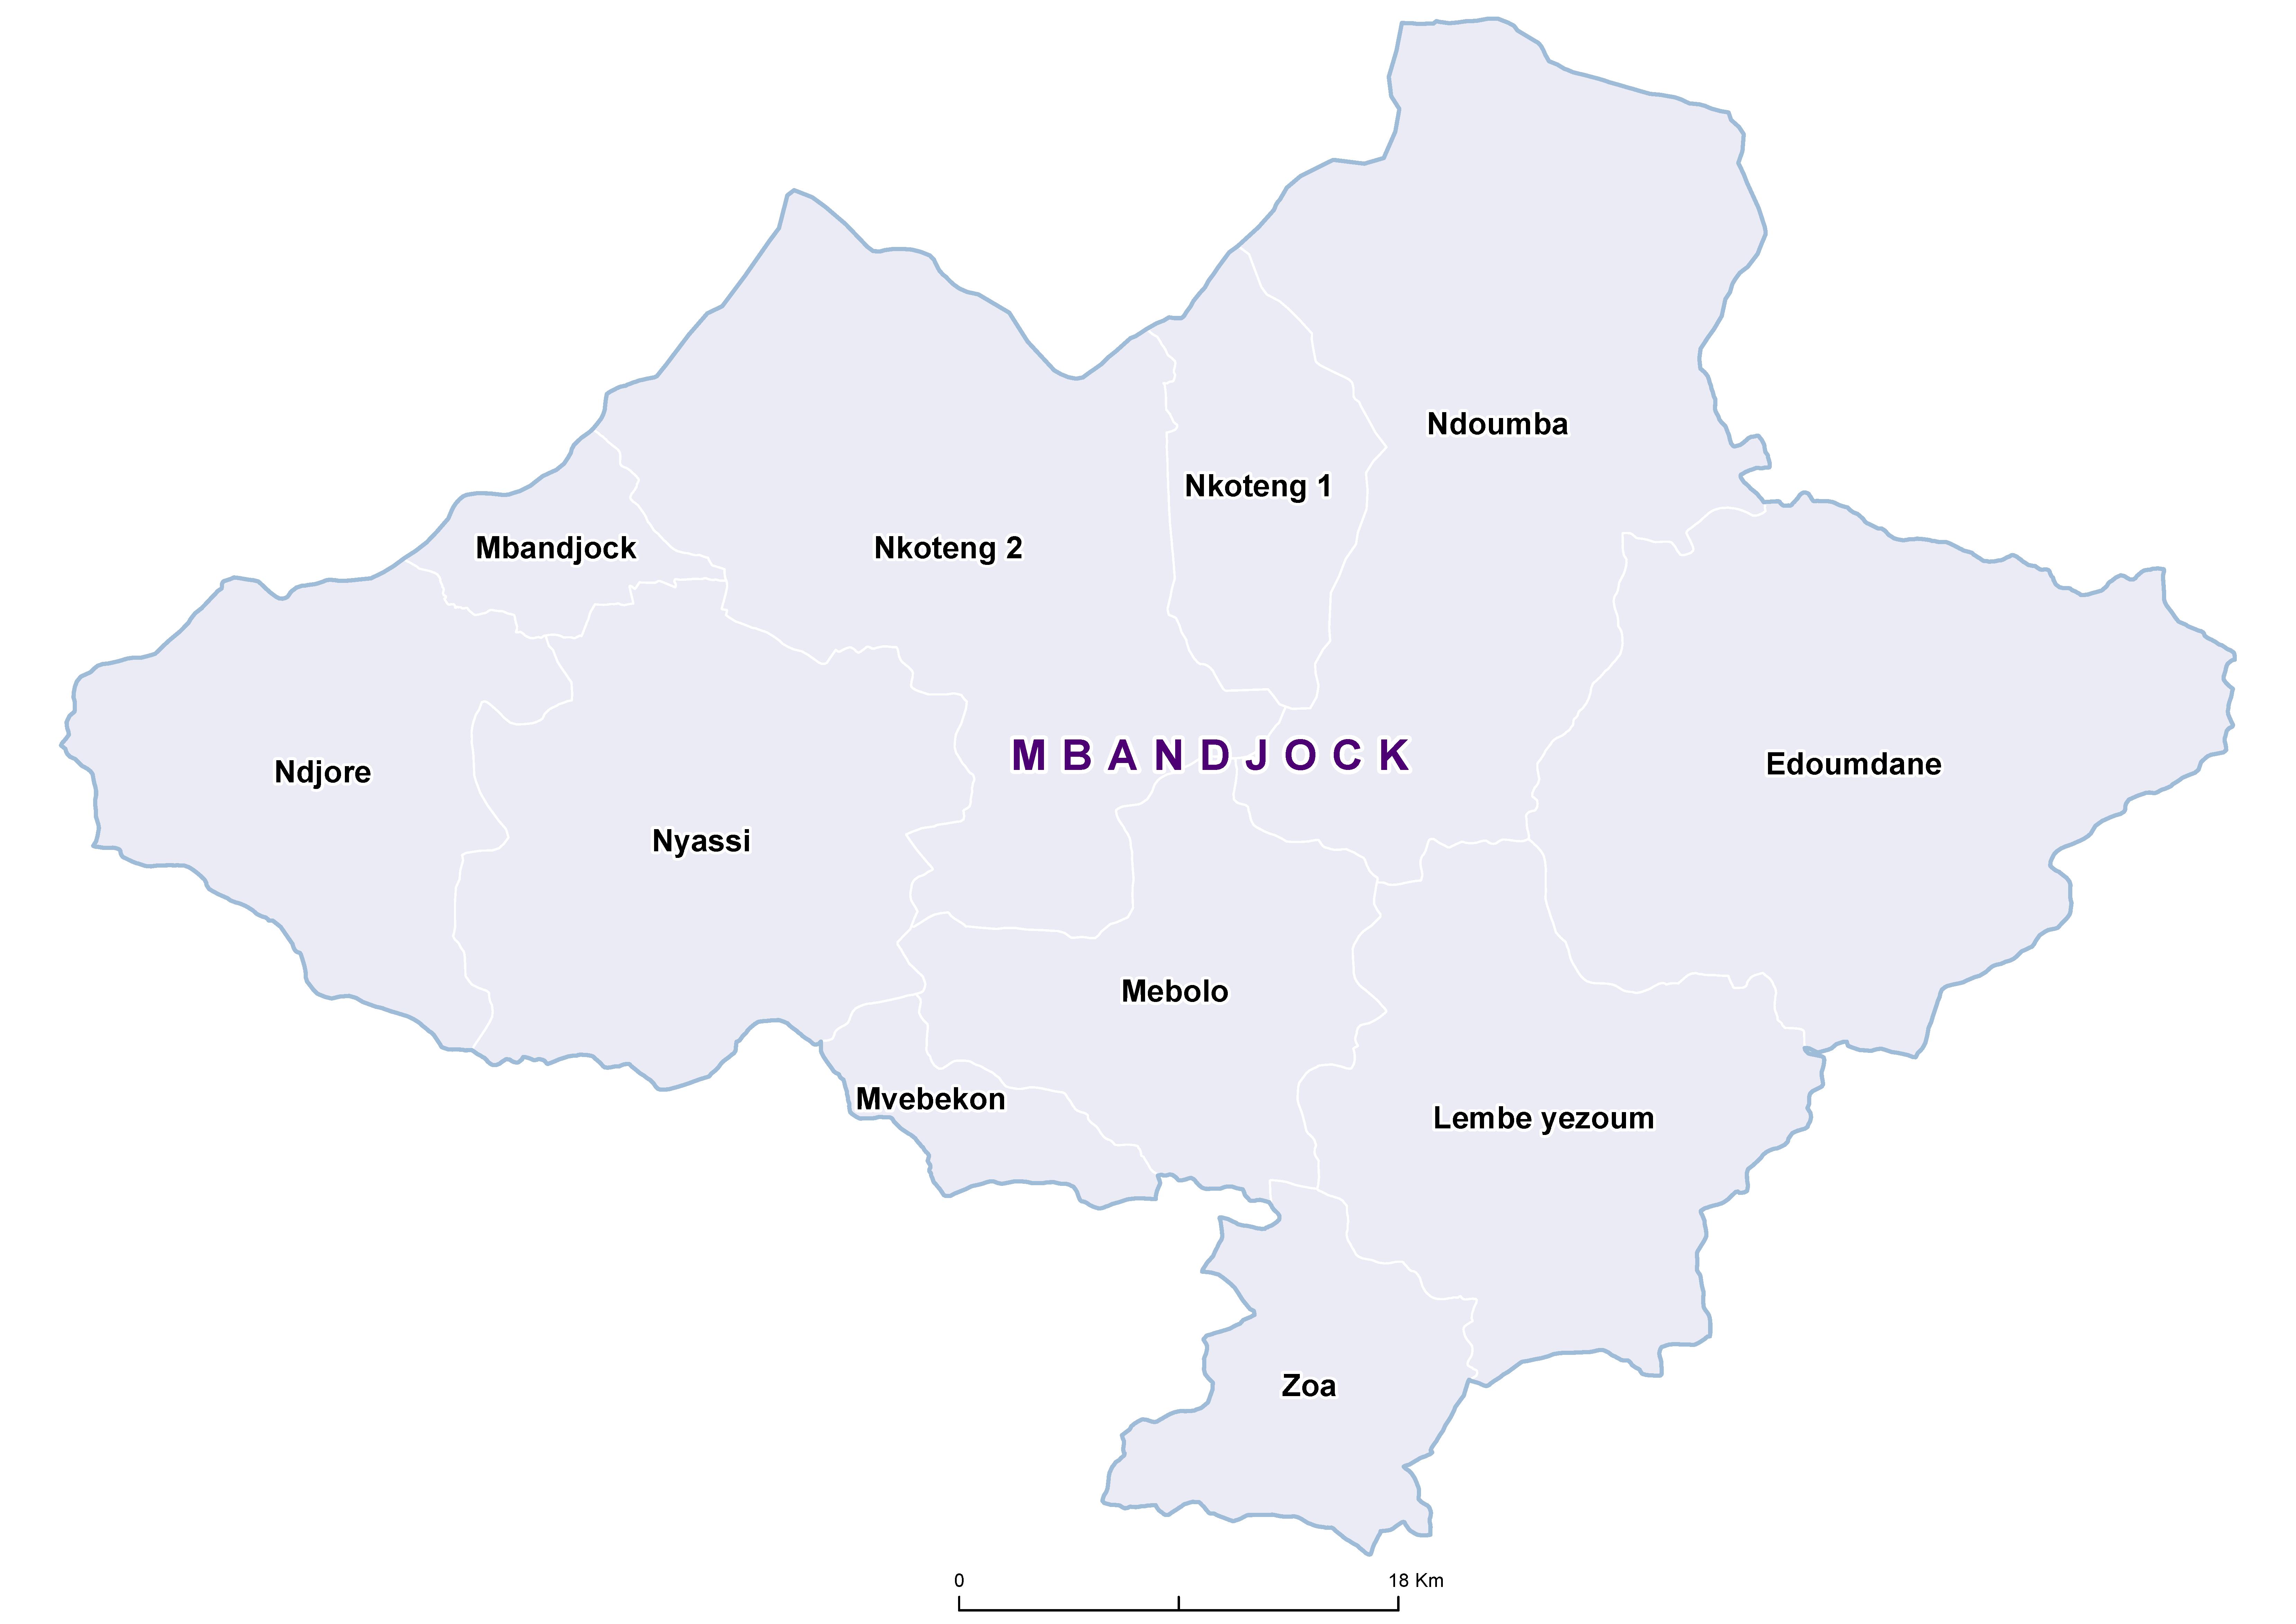 Mbandjock SCH 20180001